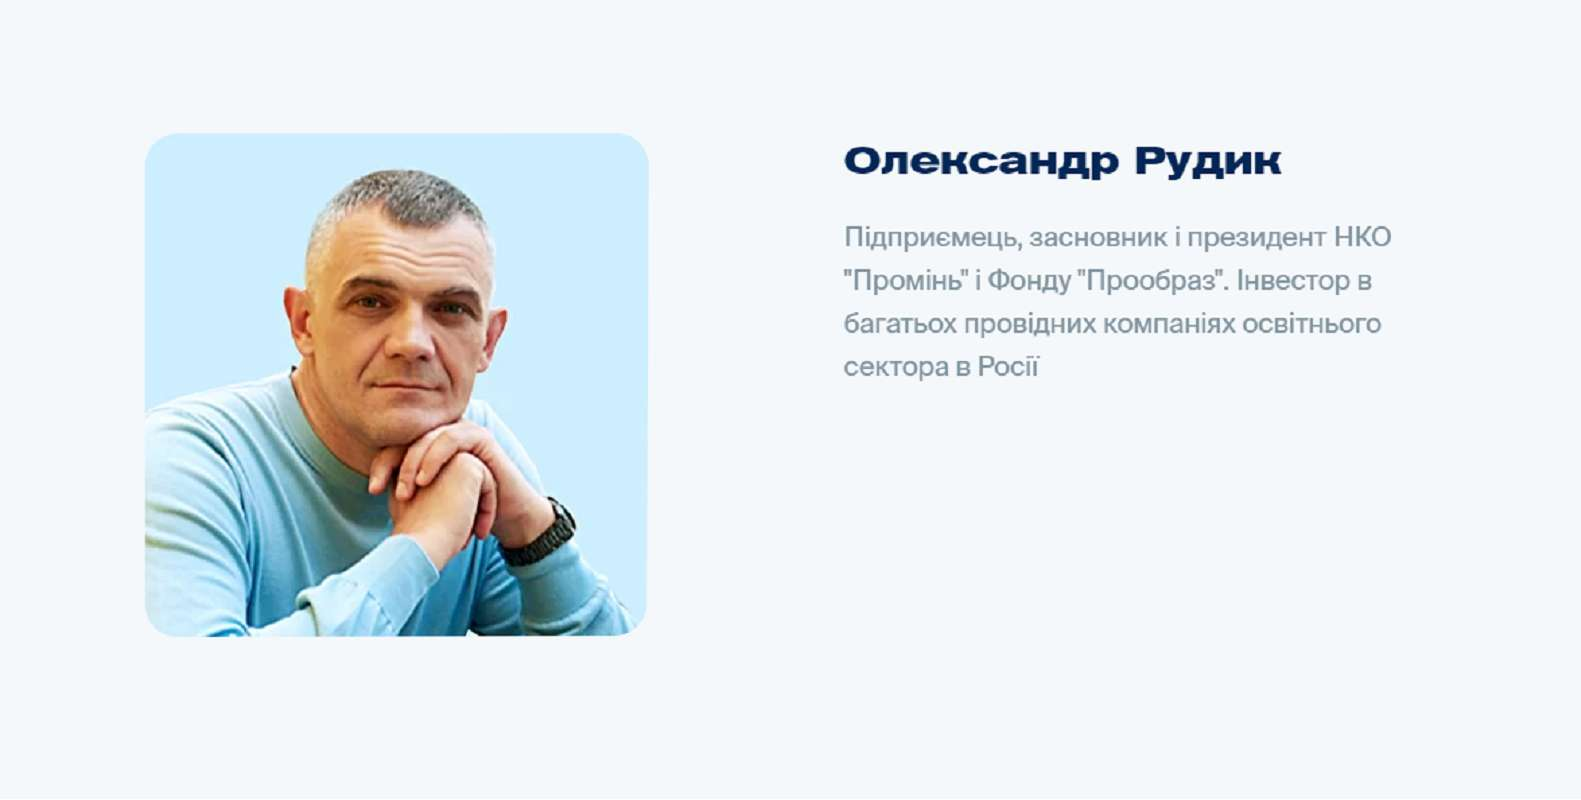 Проминь Медведчука: как лидер ОПЗЖ создавал аналог соросят - фото 5